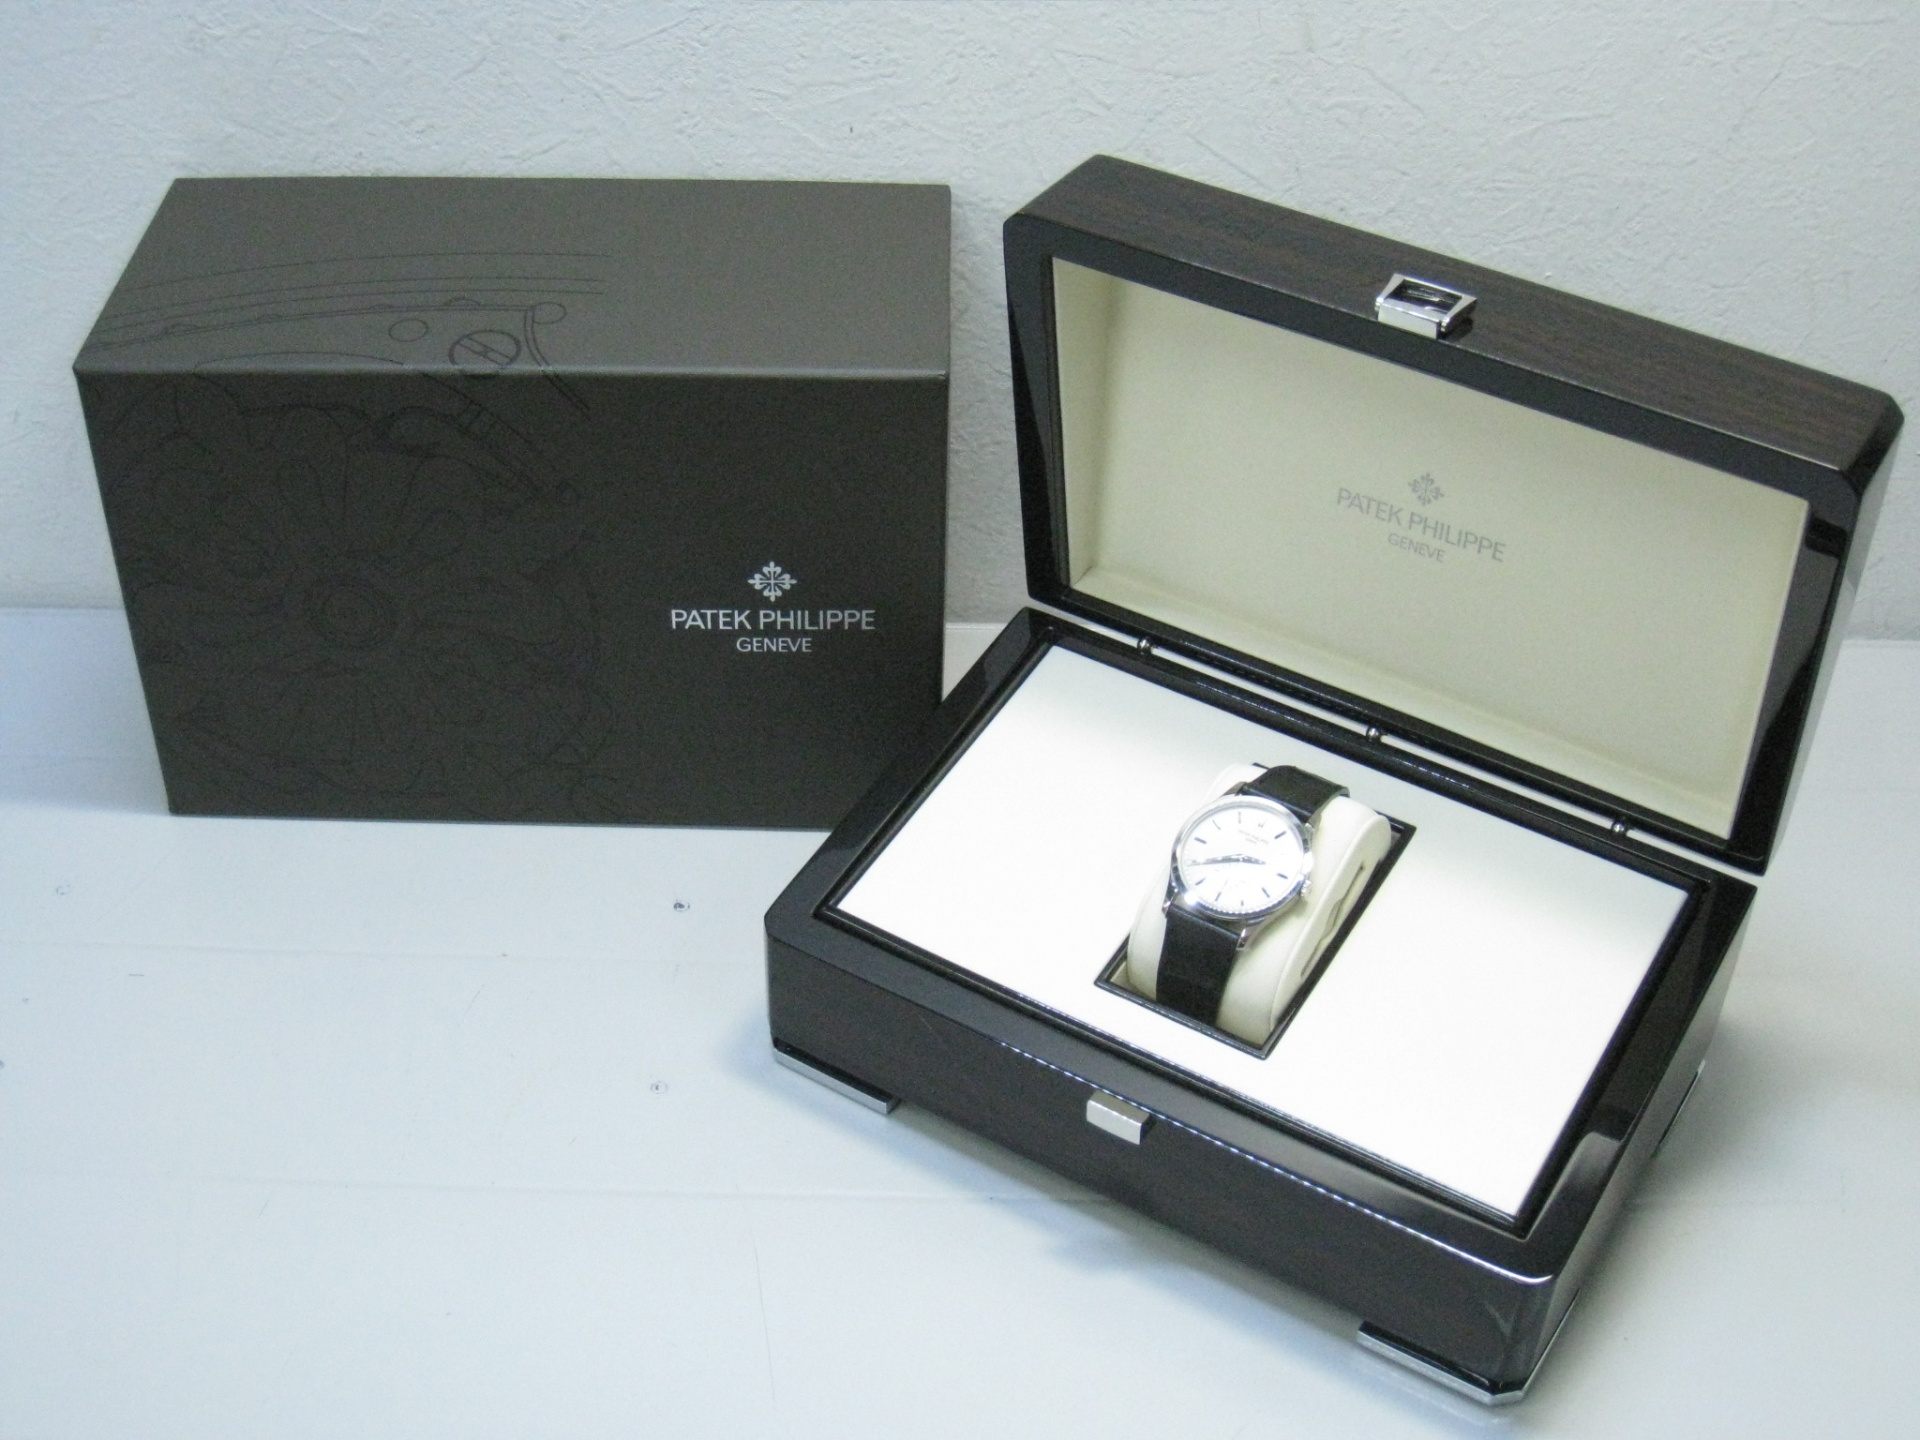 competitive price e987d 8f017 PATEK PHILIPPE パテックフィリップ カラトラバ 5196G-001 ...